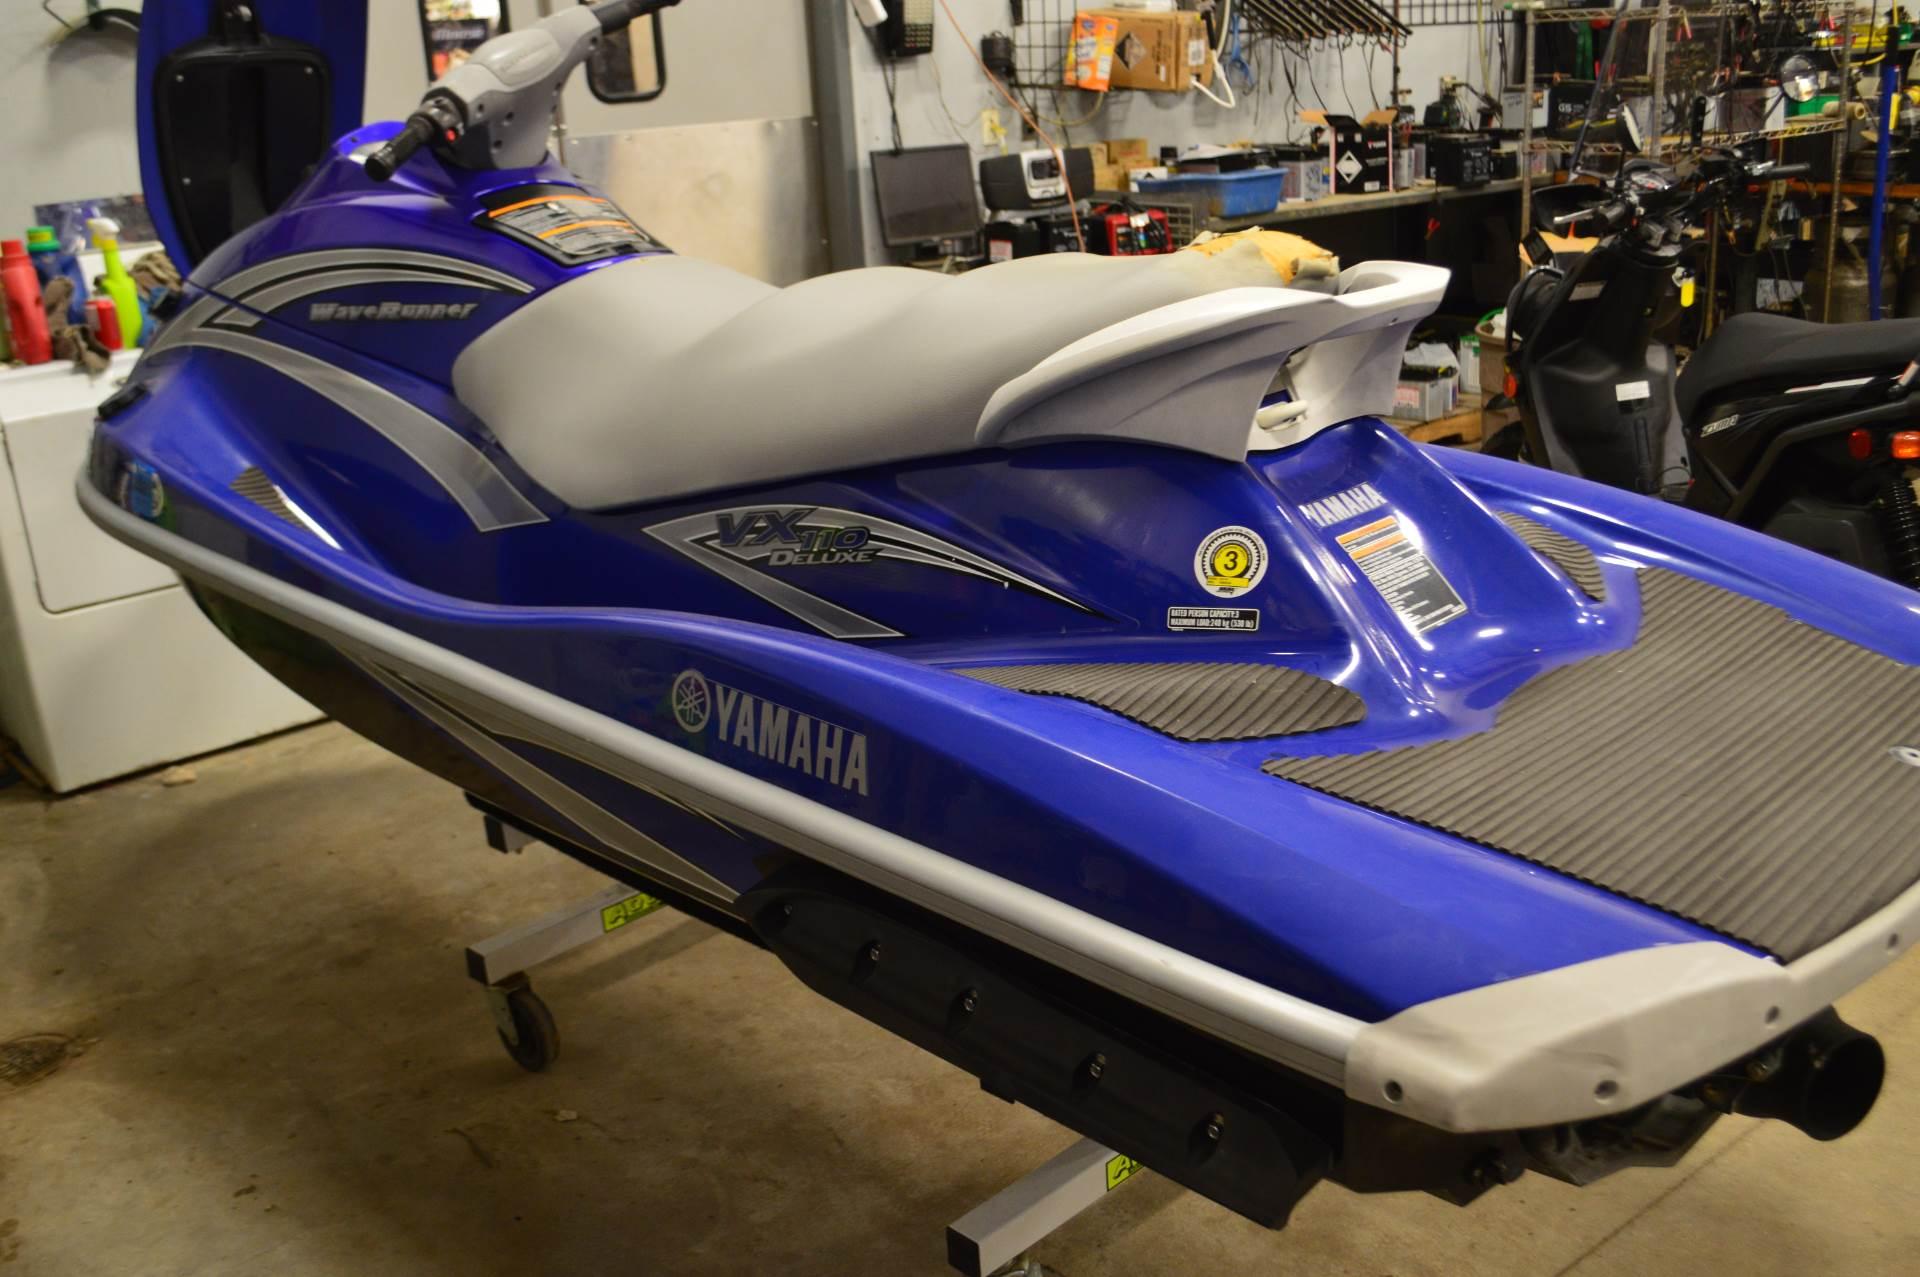 2006 Yamaha VX 110 Deluxe 3